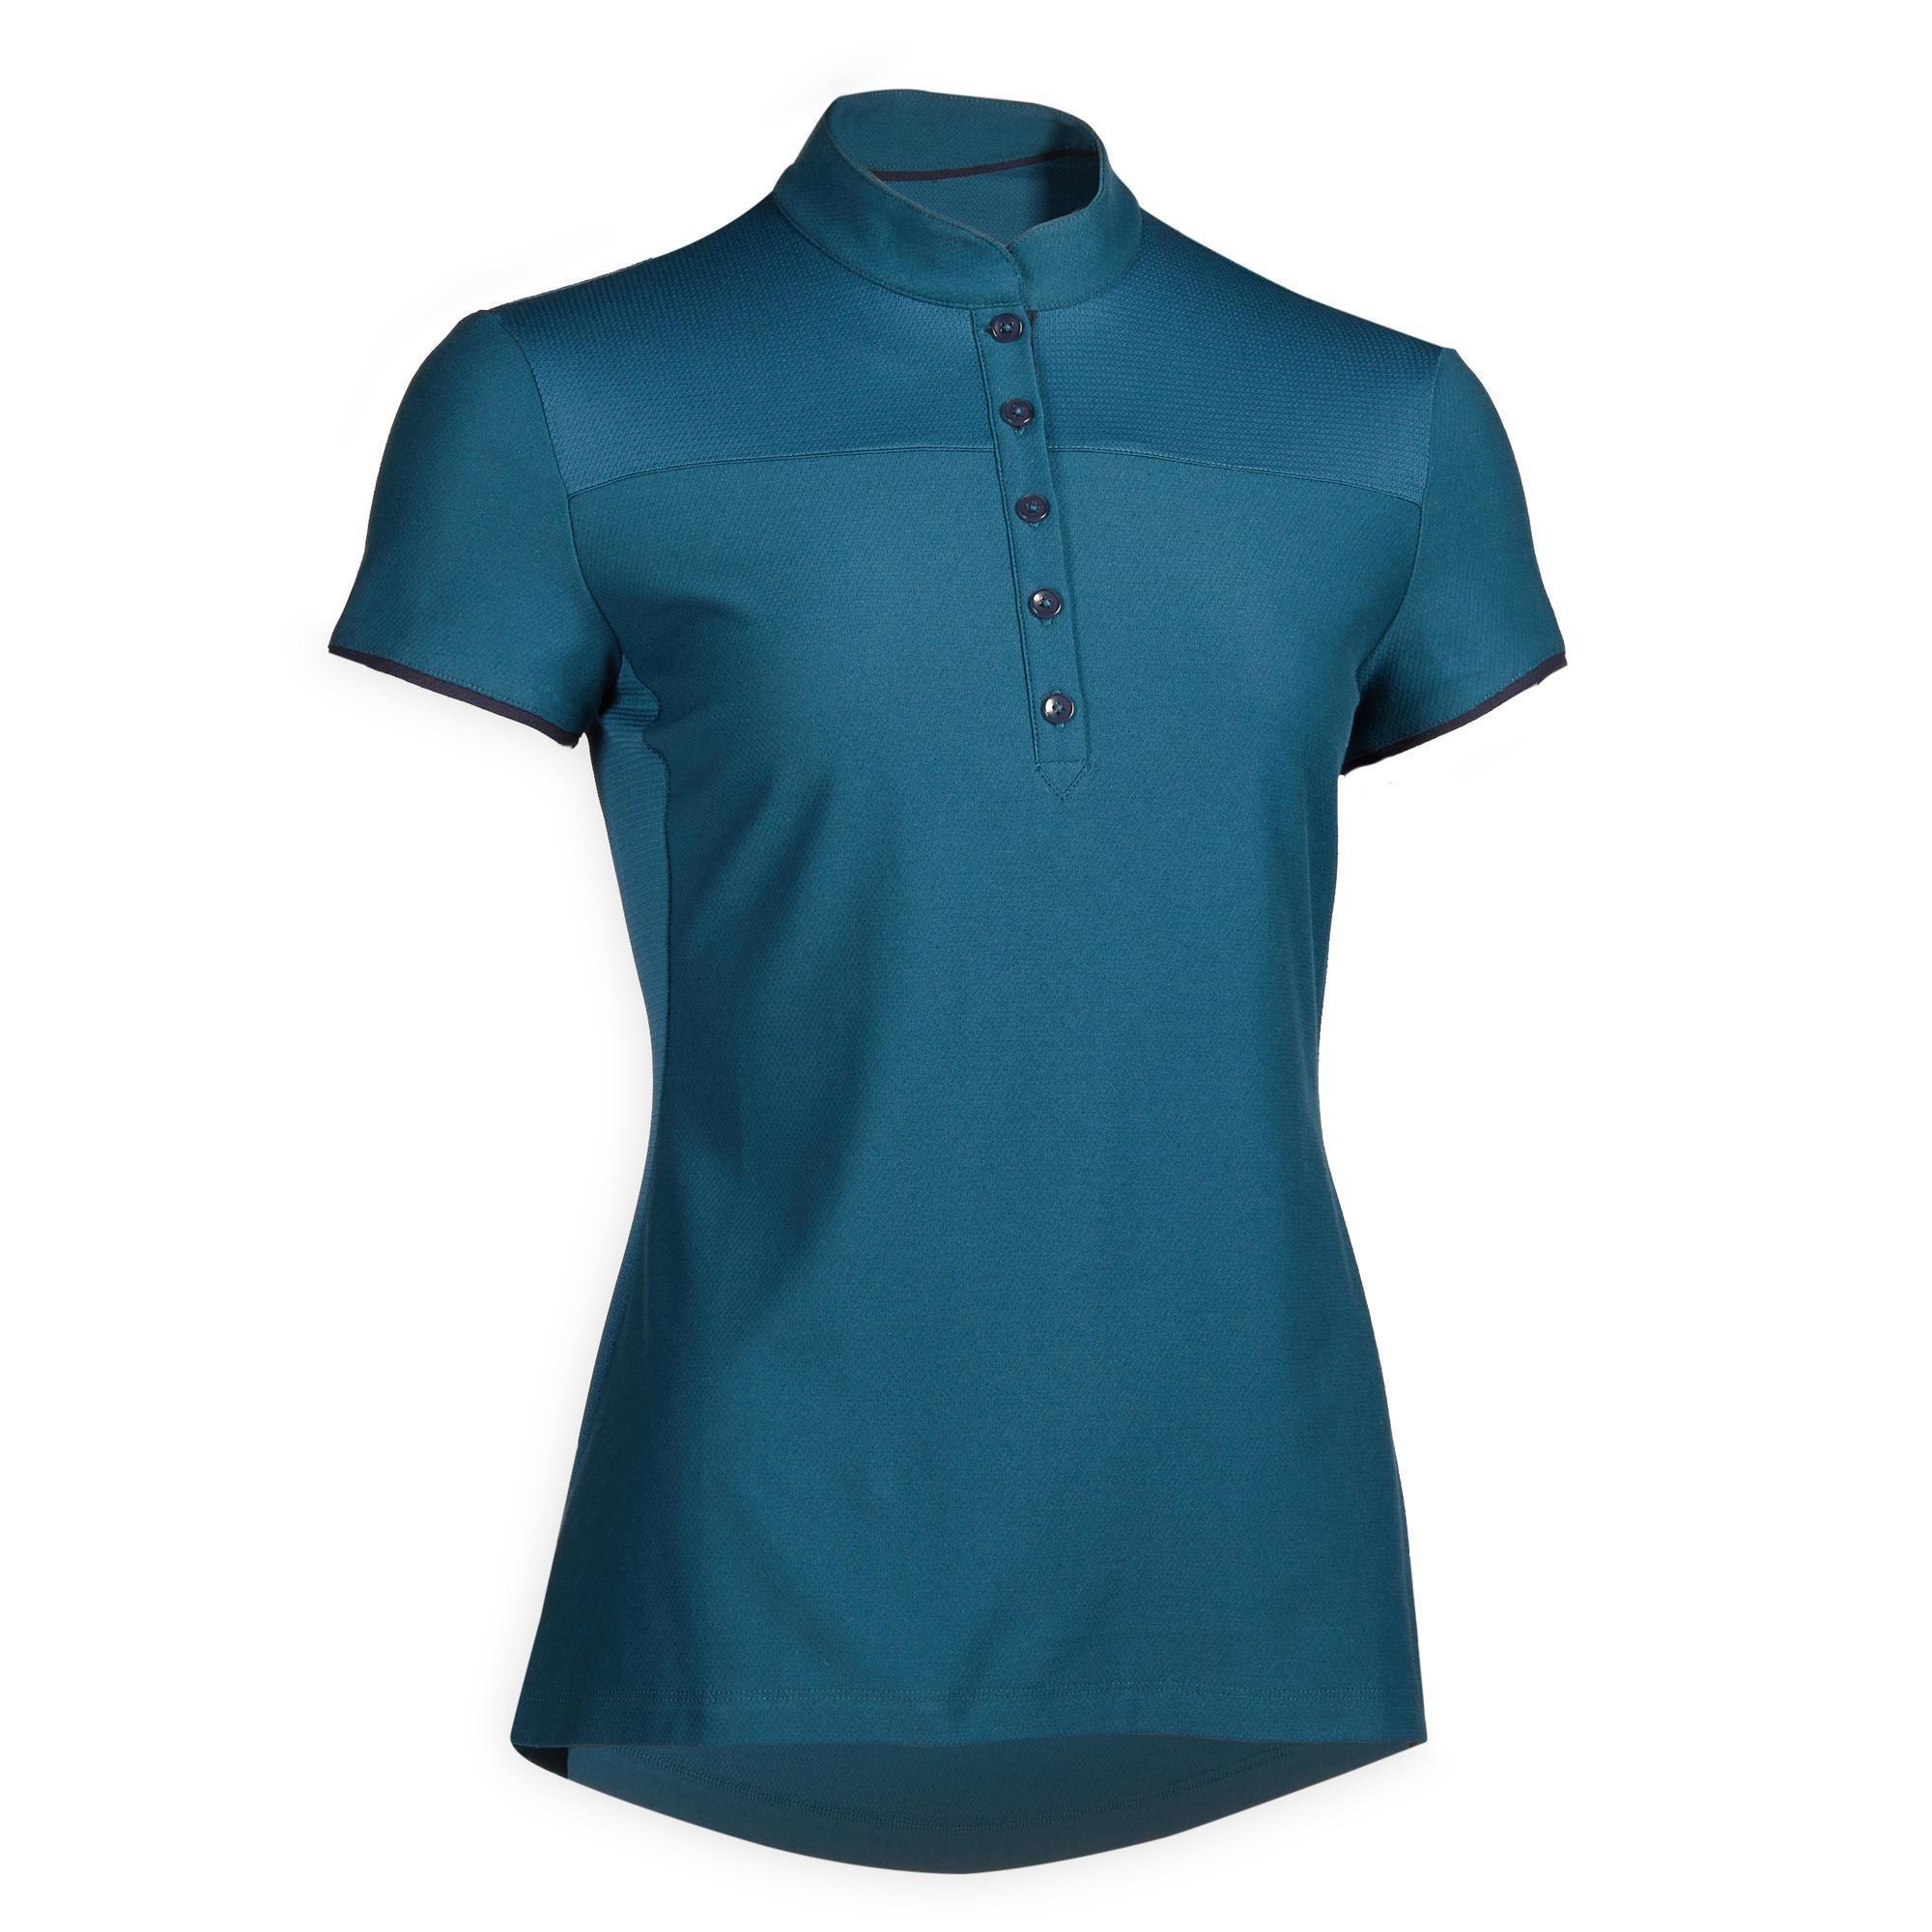 Reit-Poloshirt kurzarm 500 Damen petrolblau